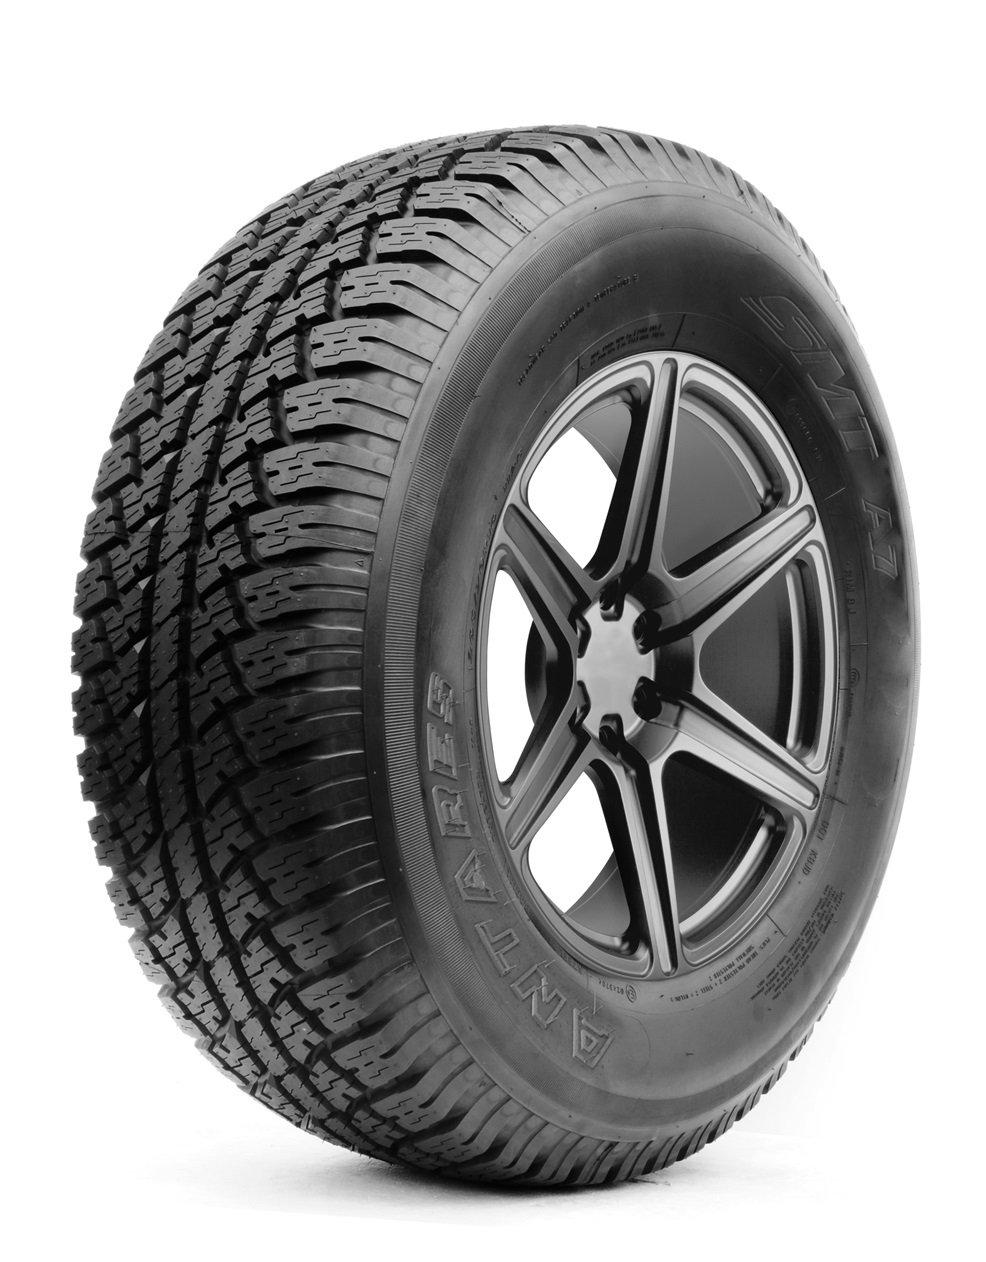 Antares SMT A7 All- Season Radial Tire-265/70R17 115S